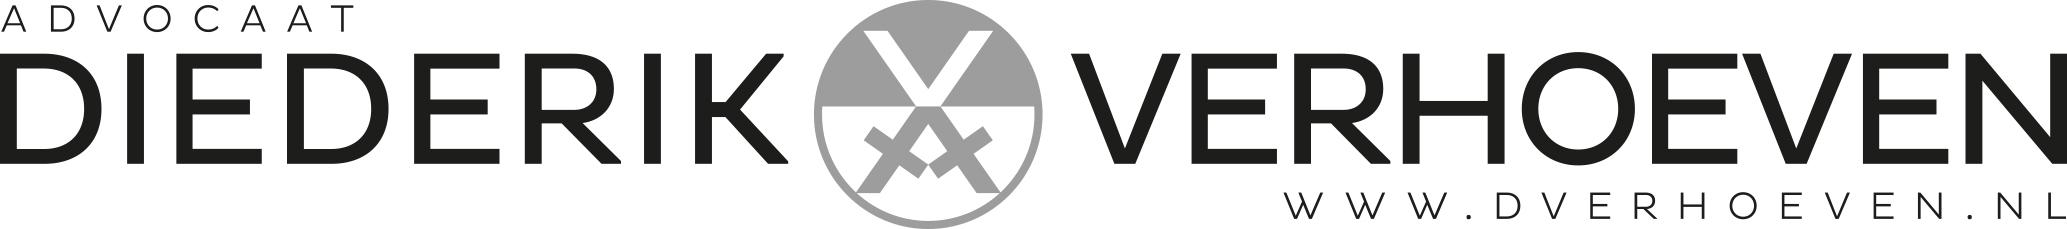 logo diederik verhoeven en web